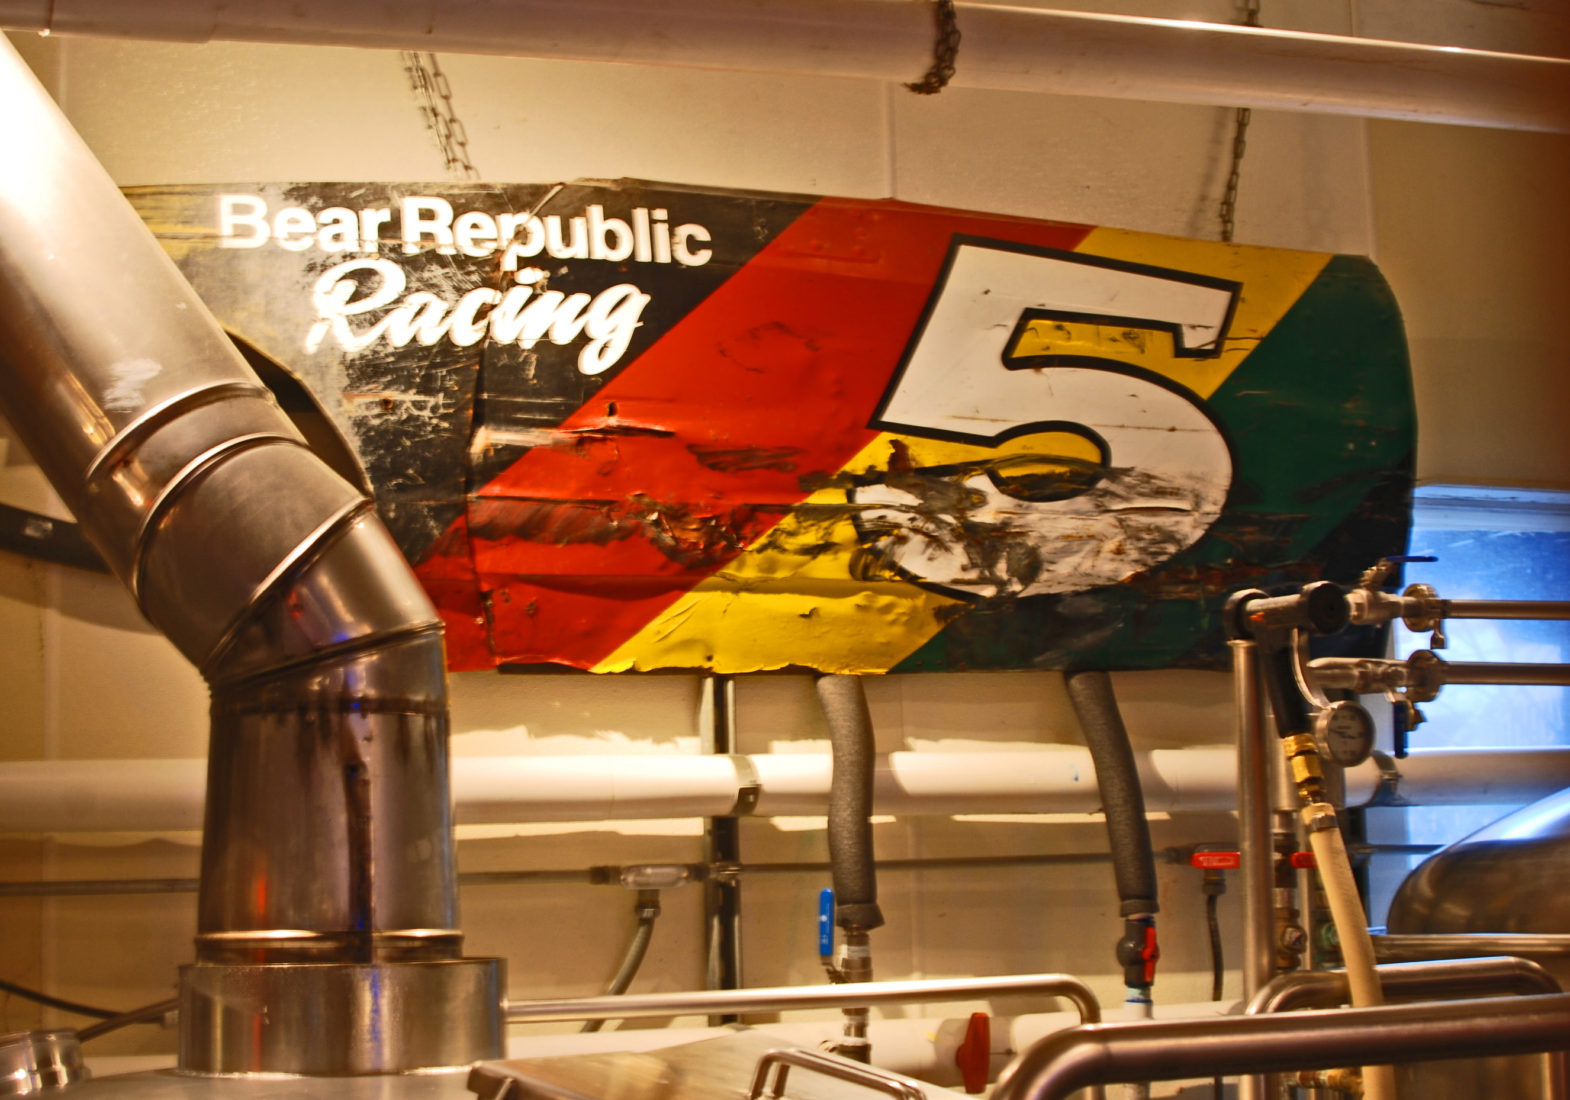 Bear Republic Brewpub, Healdsburg CA